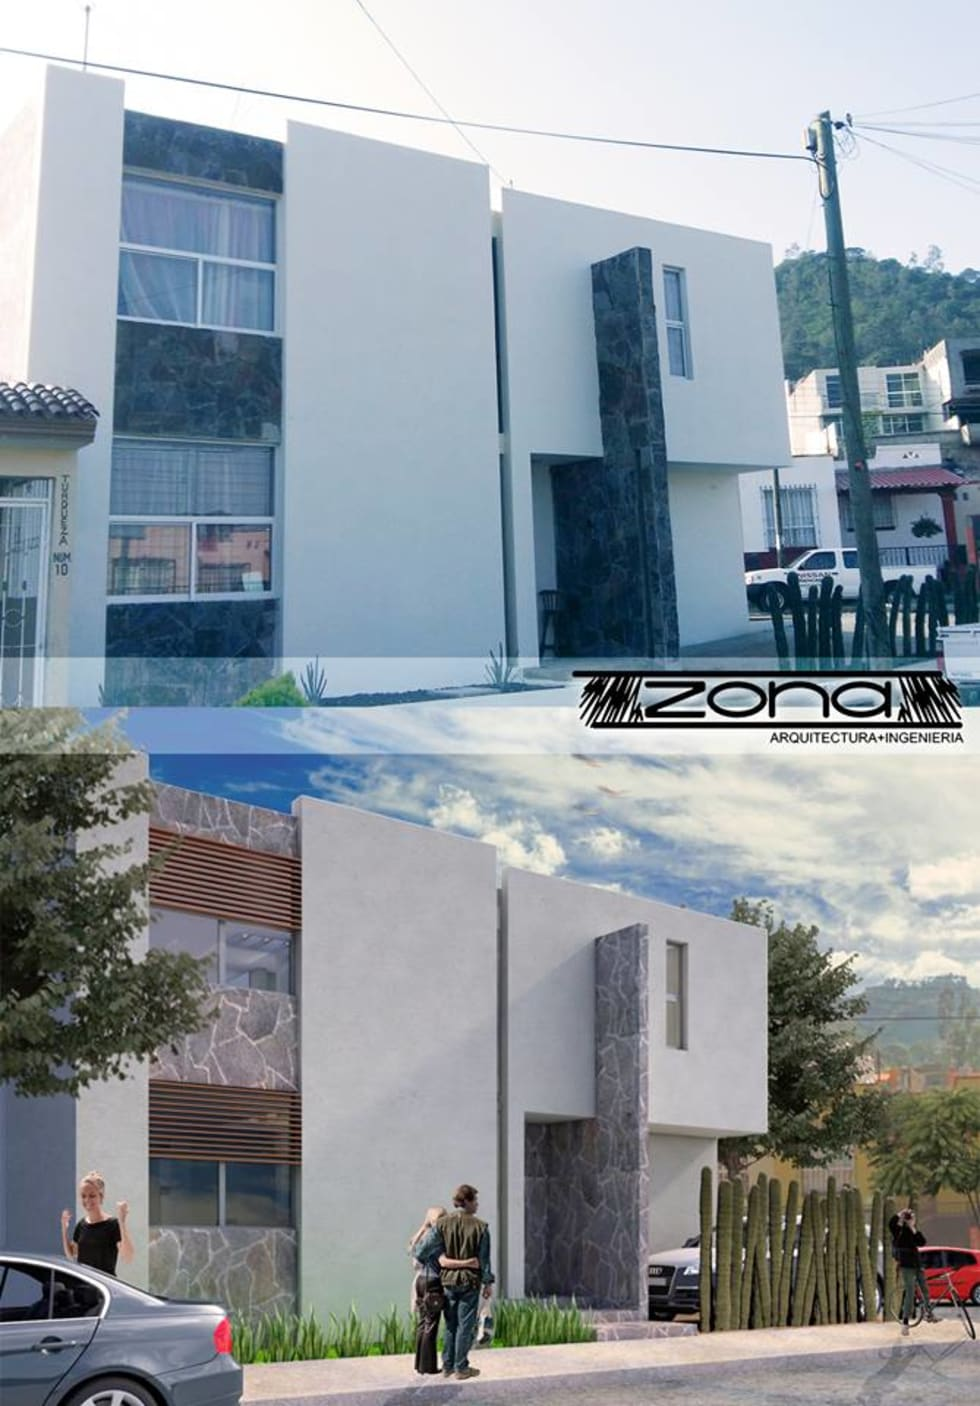 Casa de dos pisos construida en un pequeño terreno